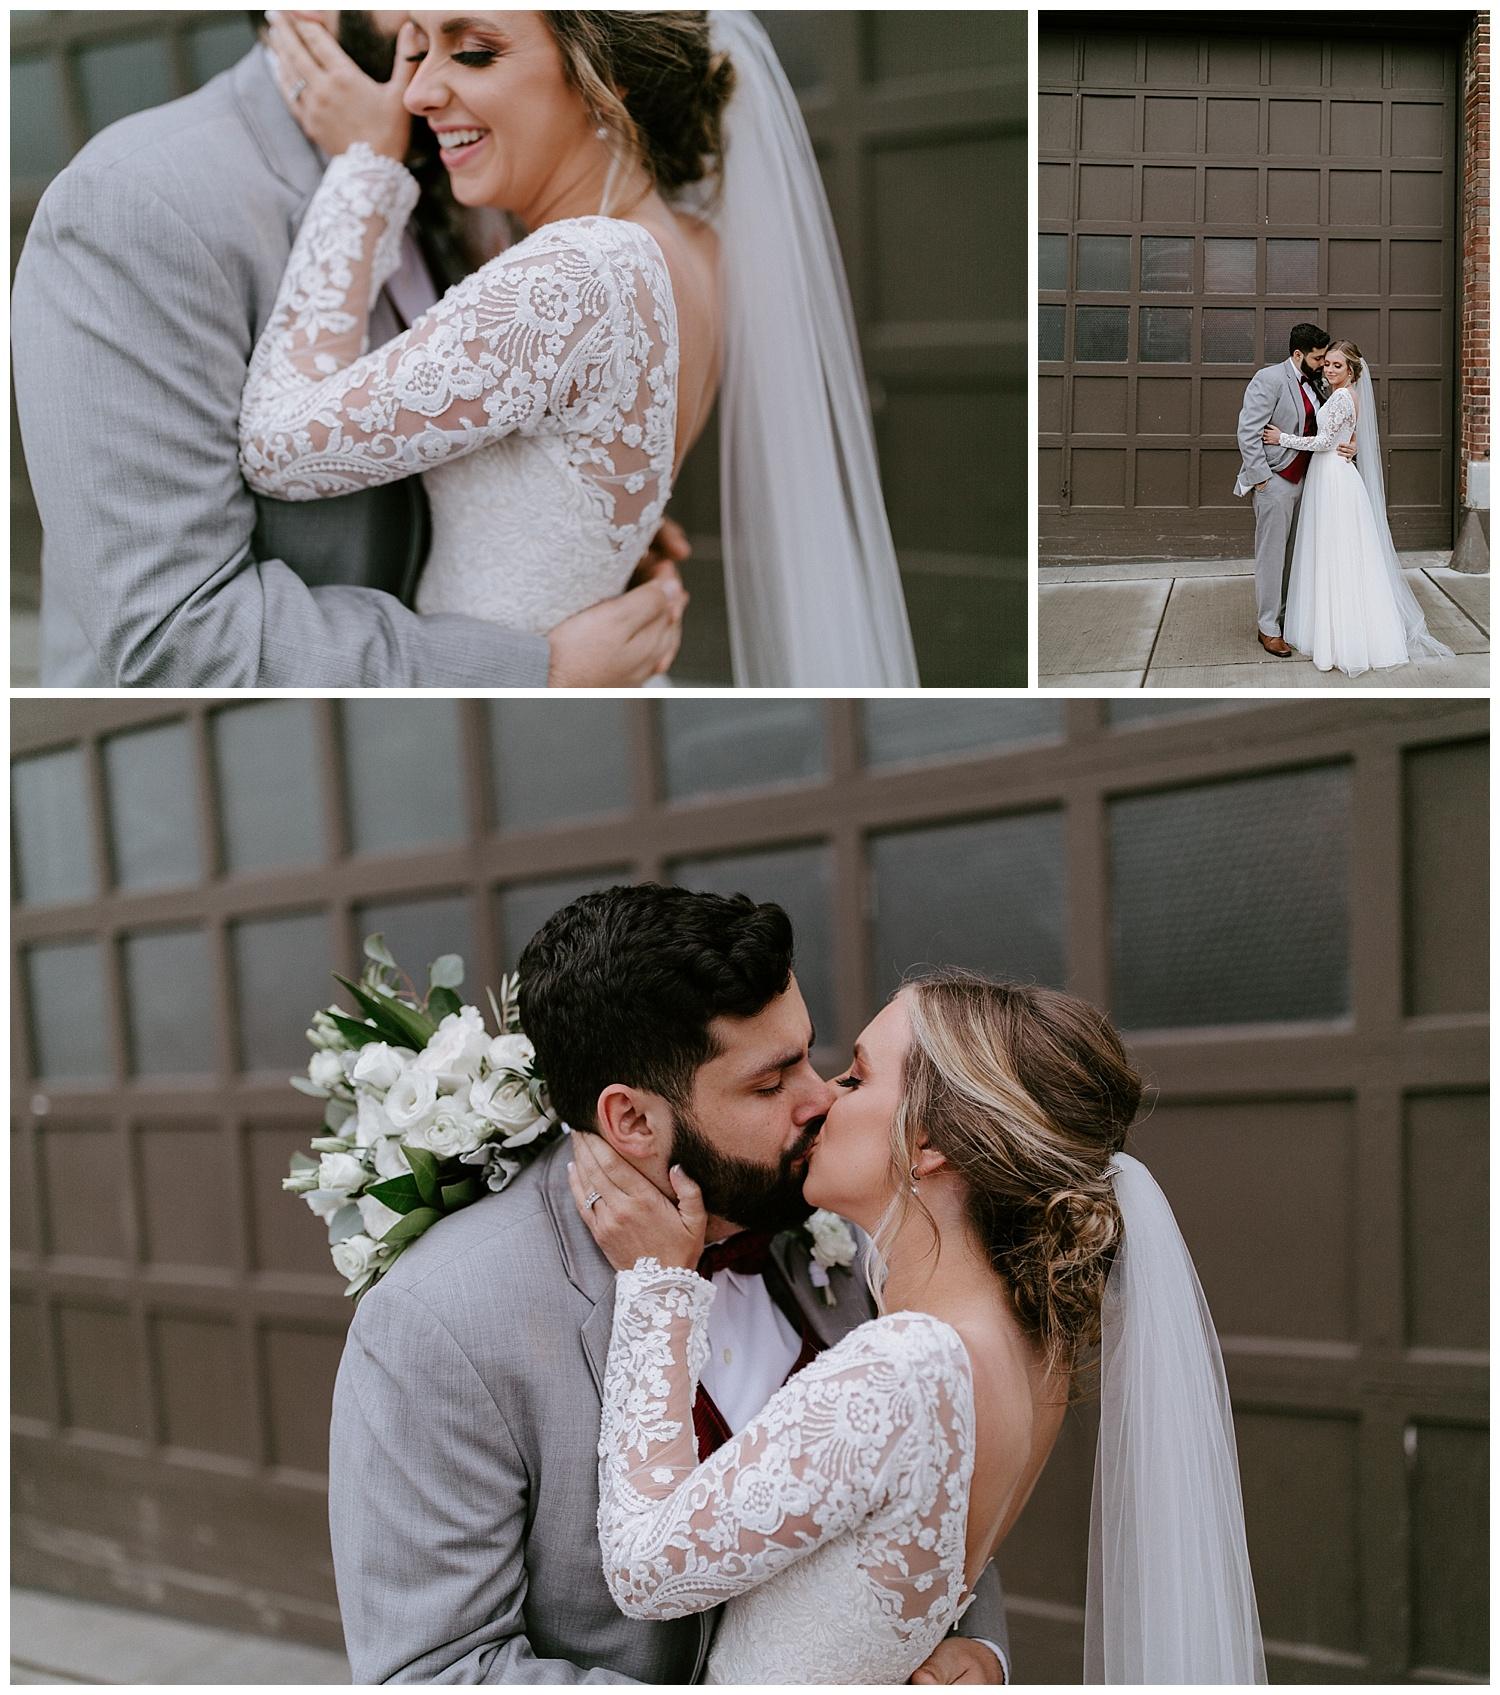 winter-wedding-the standard-knoxville_2019-01-23_0052.jpg